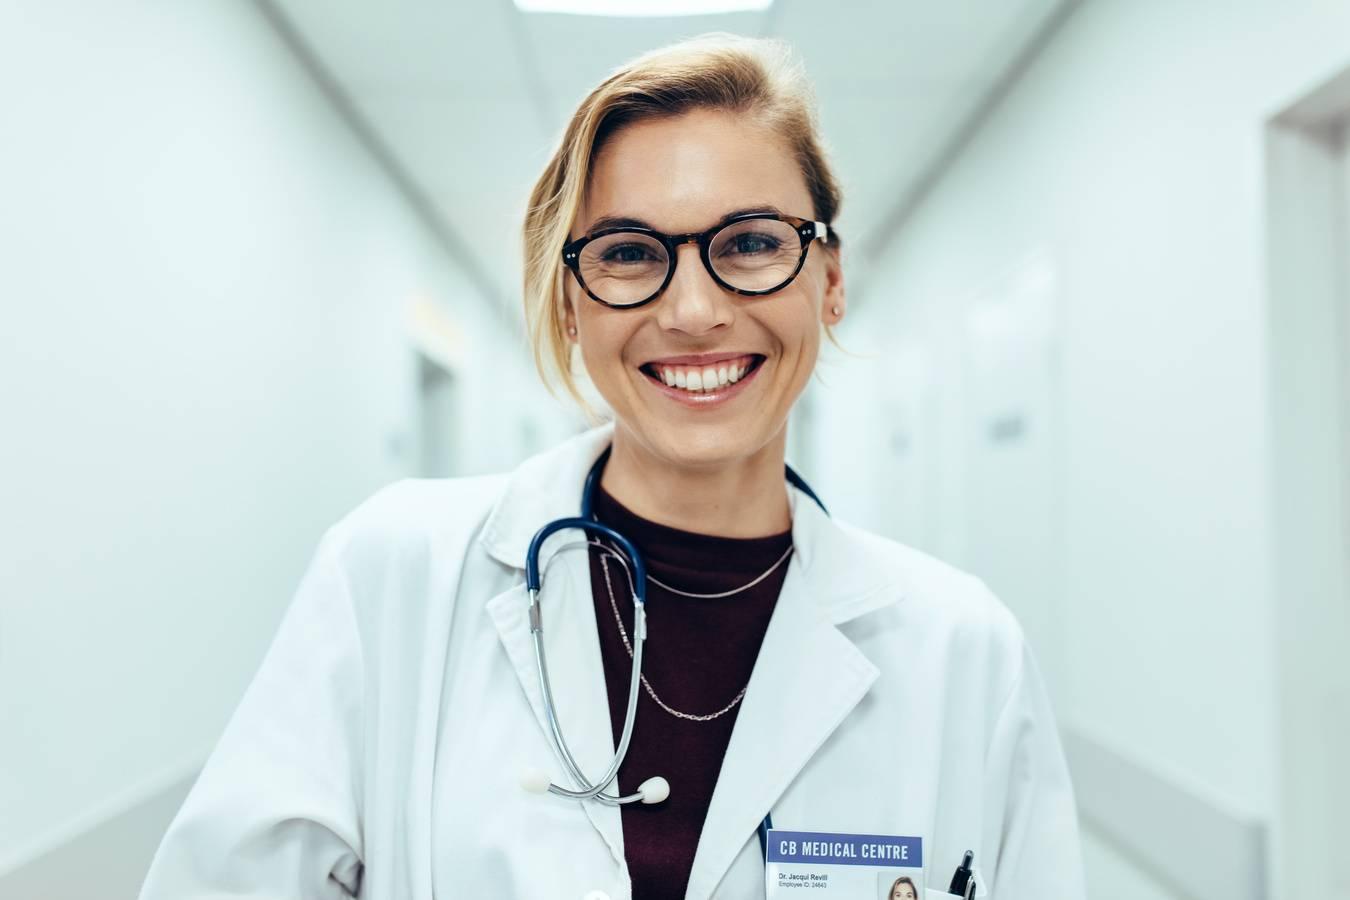 Stationsleiter – Kranken- / Alten- / Kinderkrankenpflege